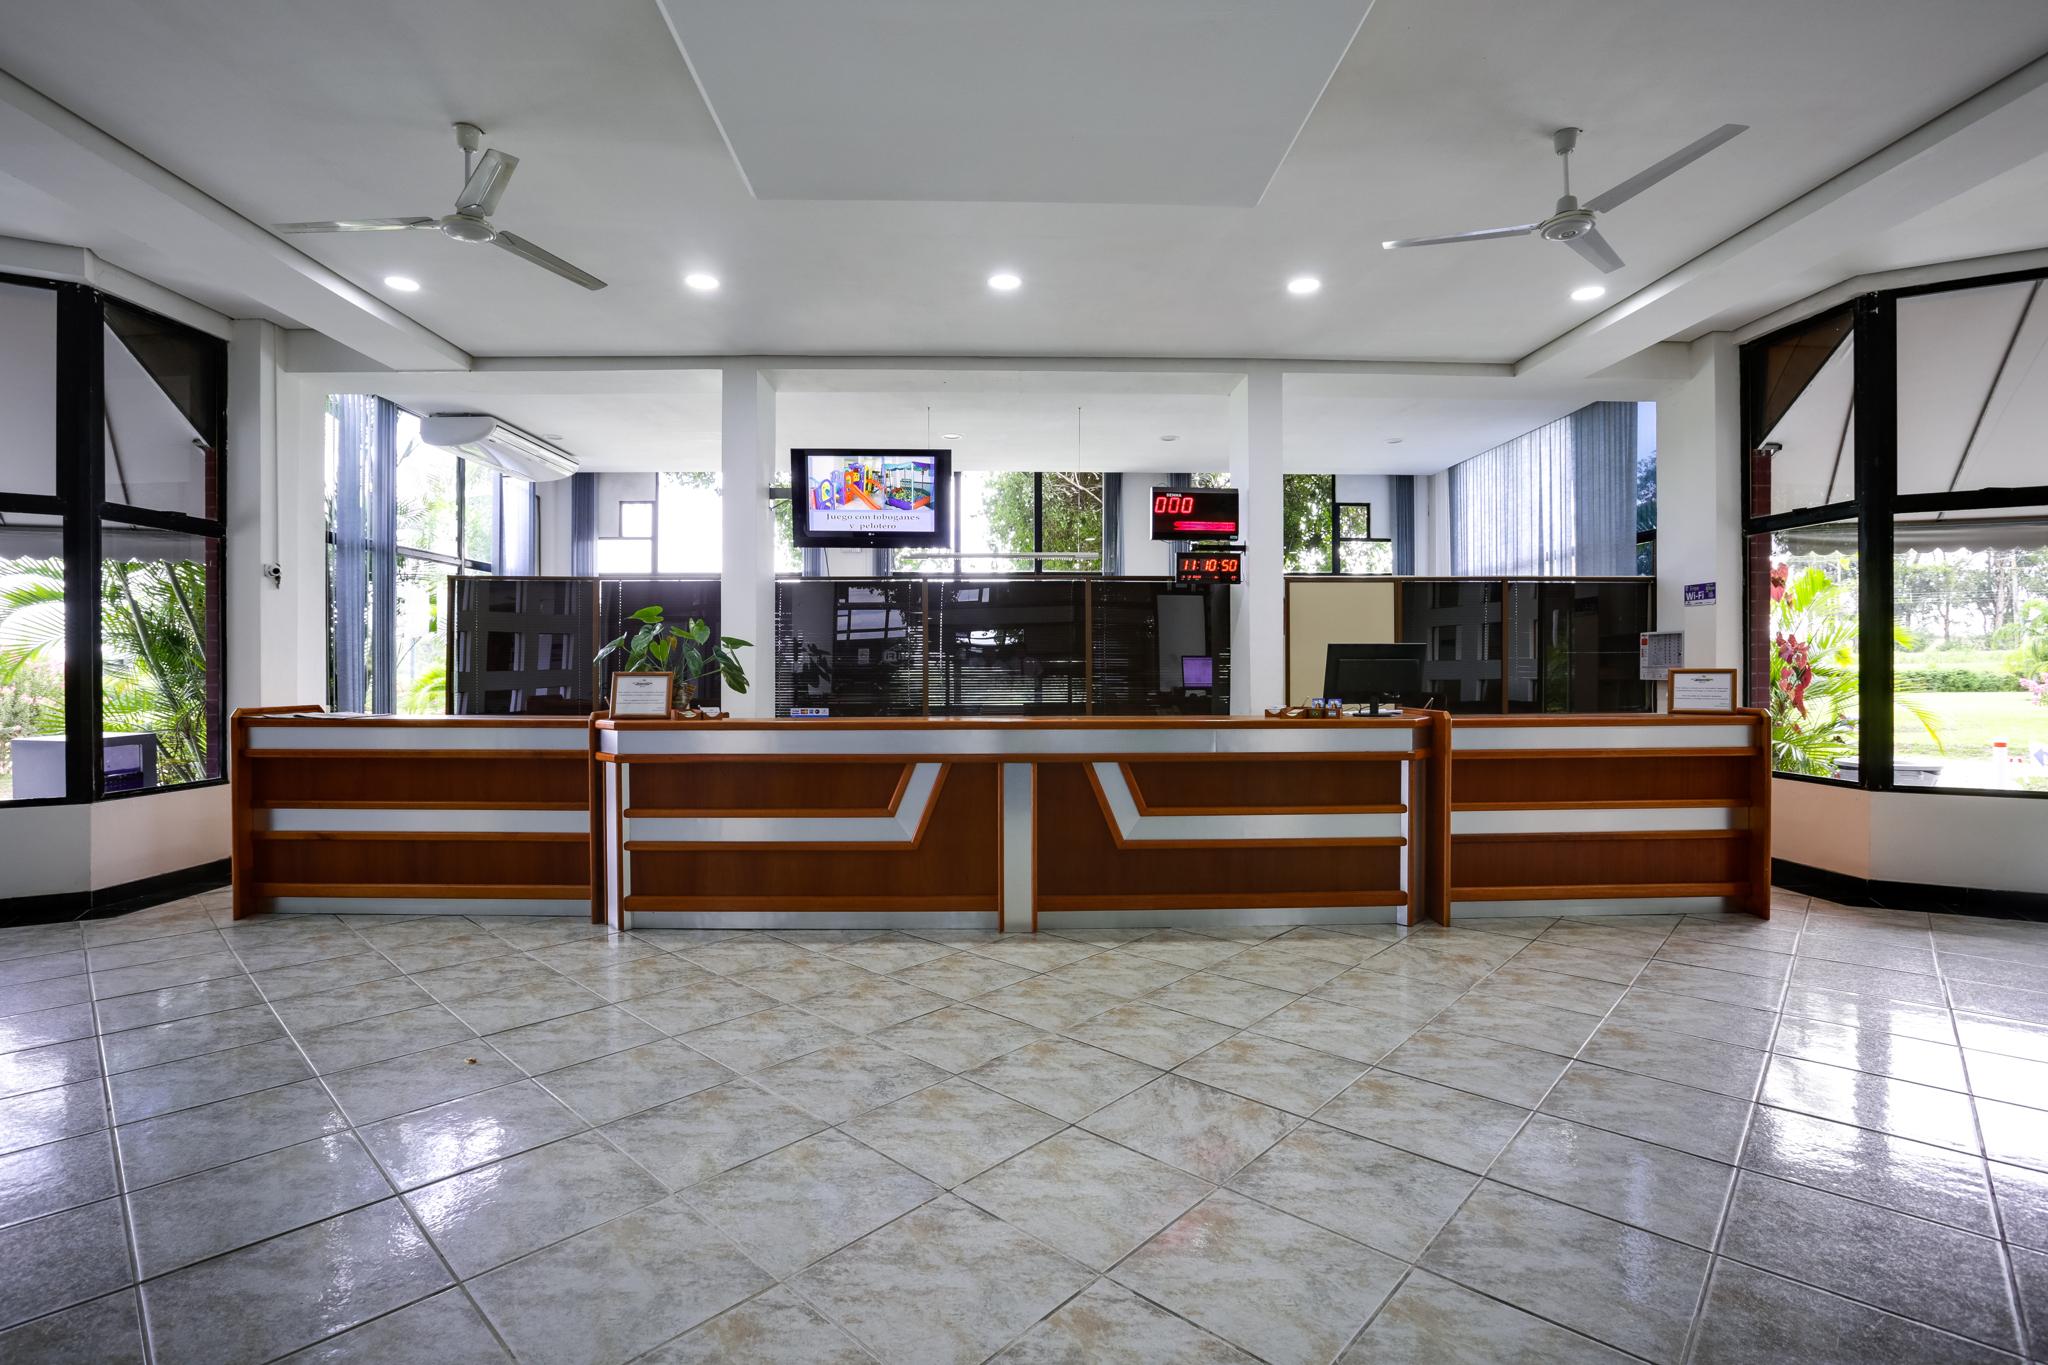 Servcos_Hotel_San_Isidro_-_São_Gabriel_S